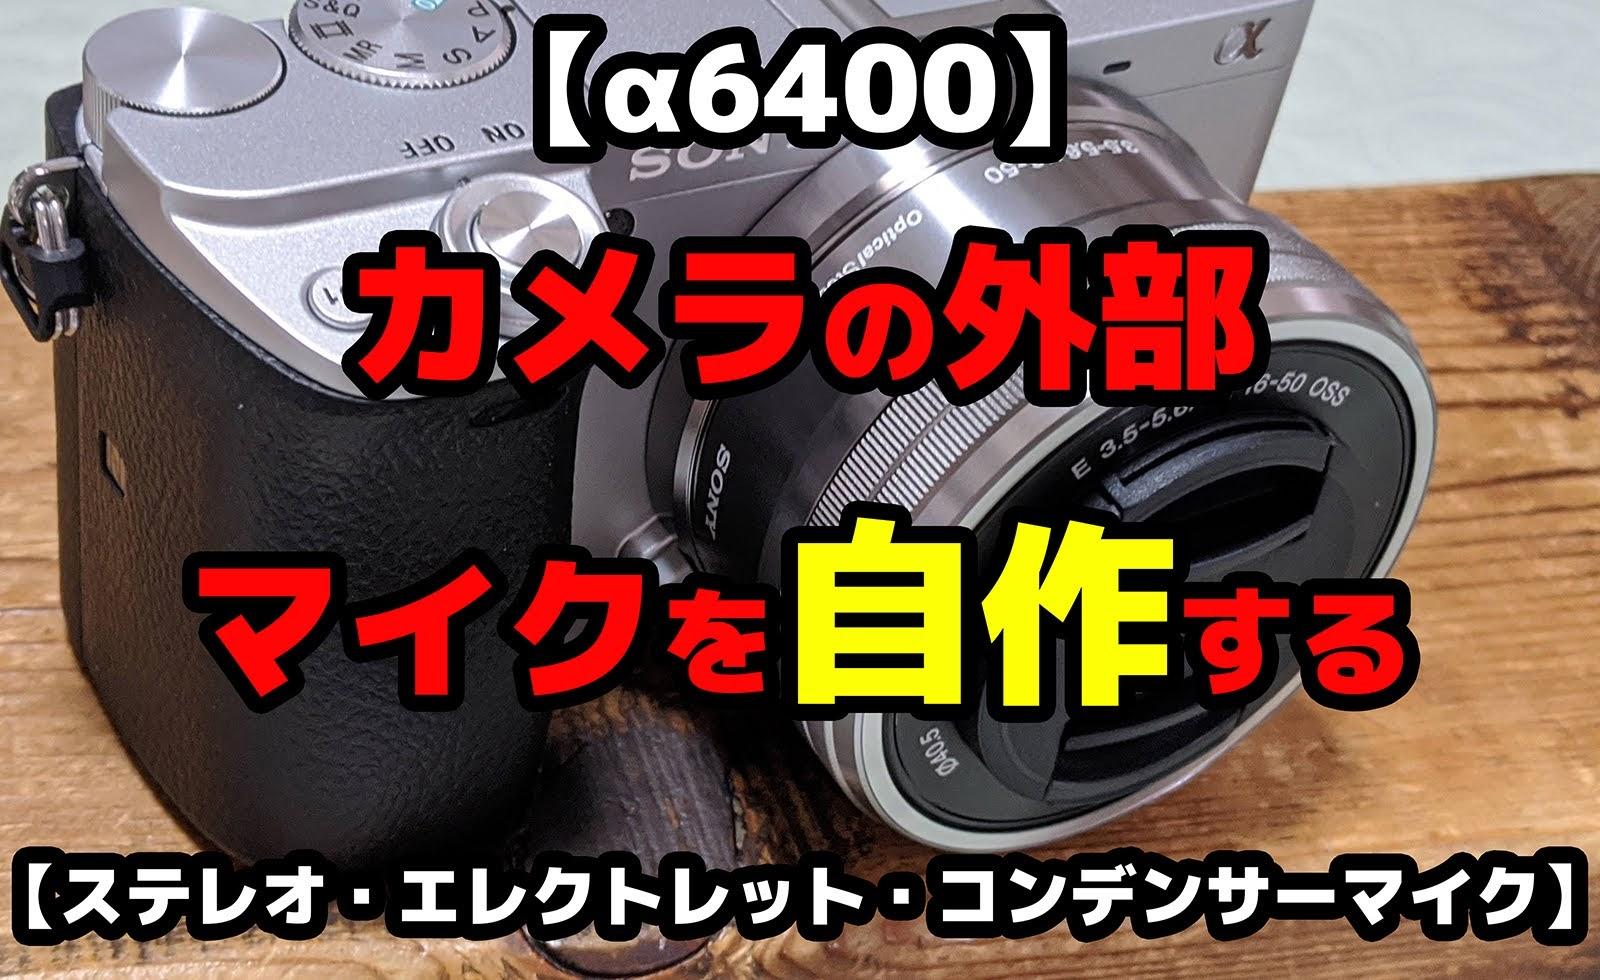 【α6400】カメラの外部マイクを自作する【ステレオ・エレクトレット・コンデンサーマイク】